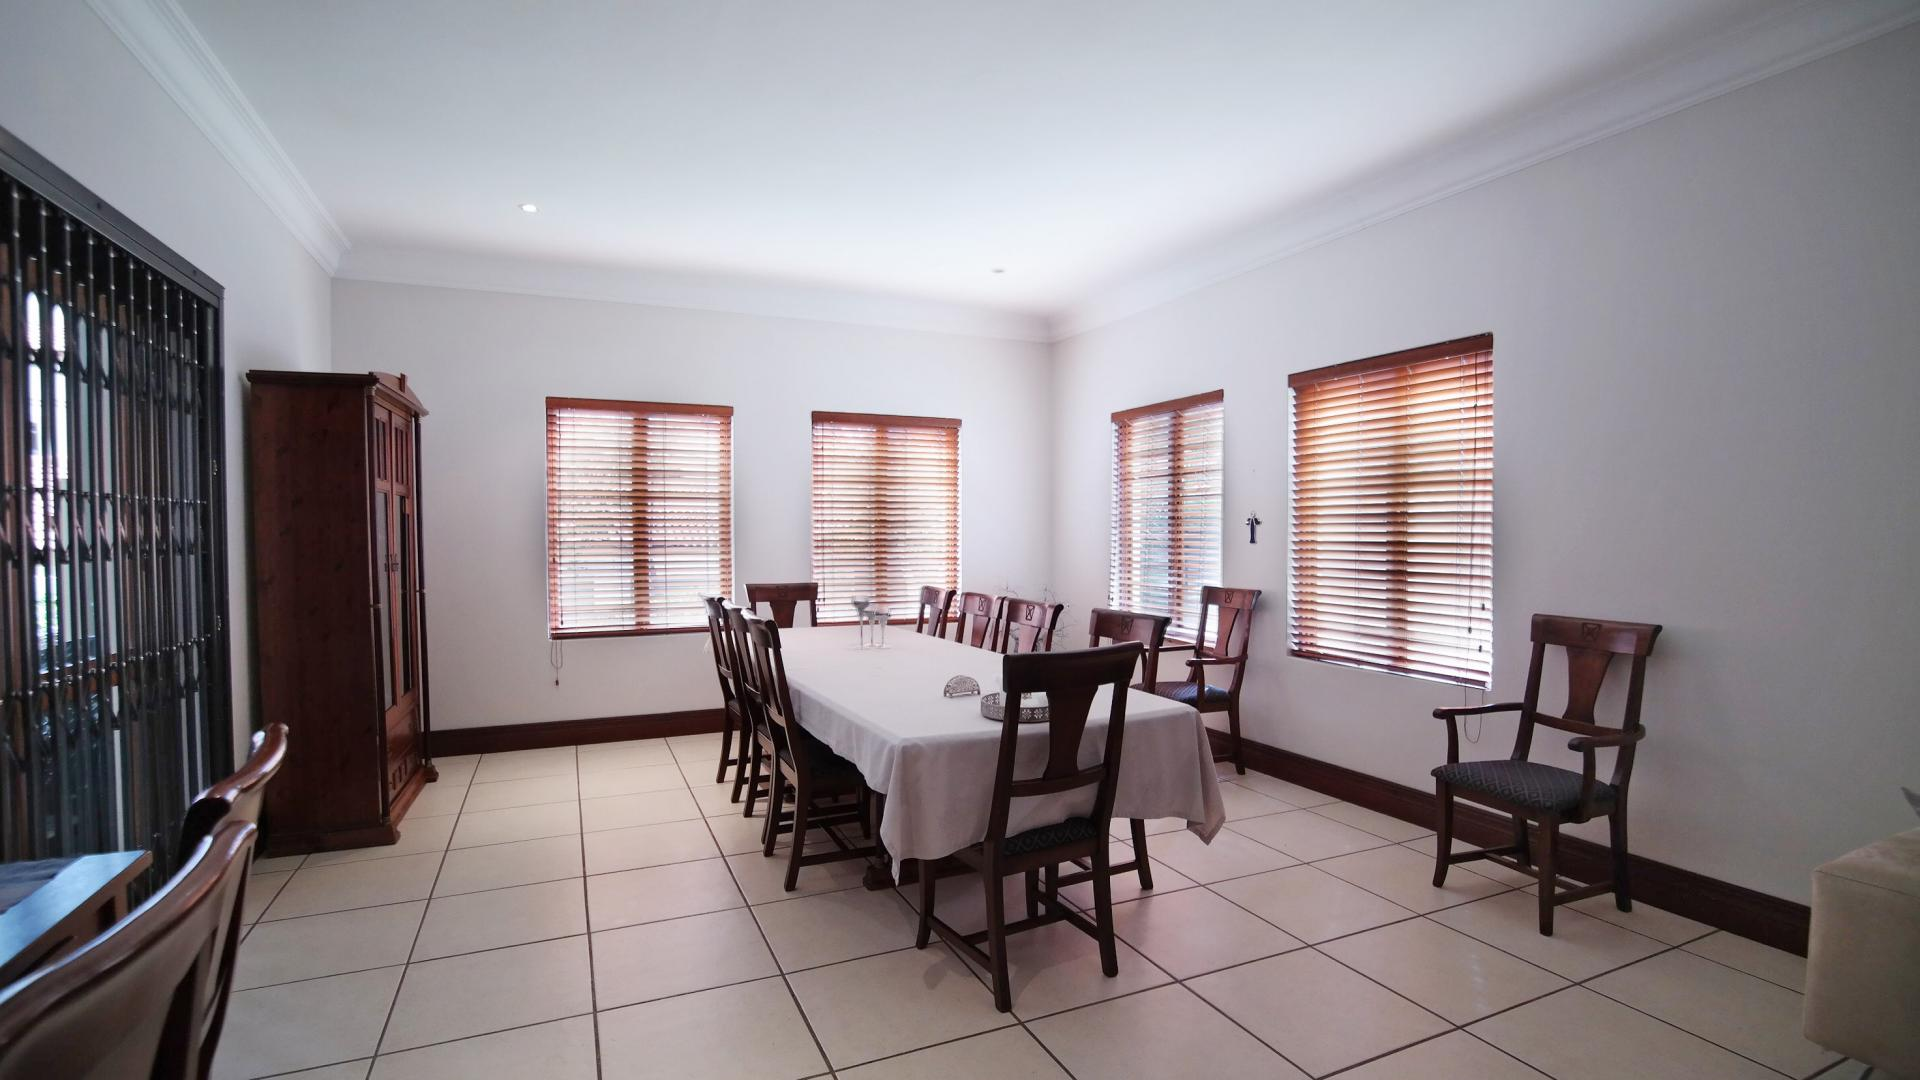 Spelling Manor Floor Plan 4 Bedroom House For Sale For Sale In Boardwalk Manor